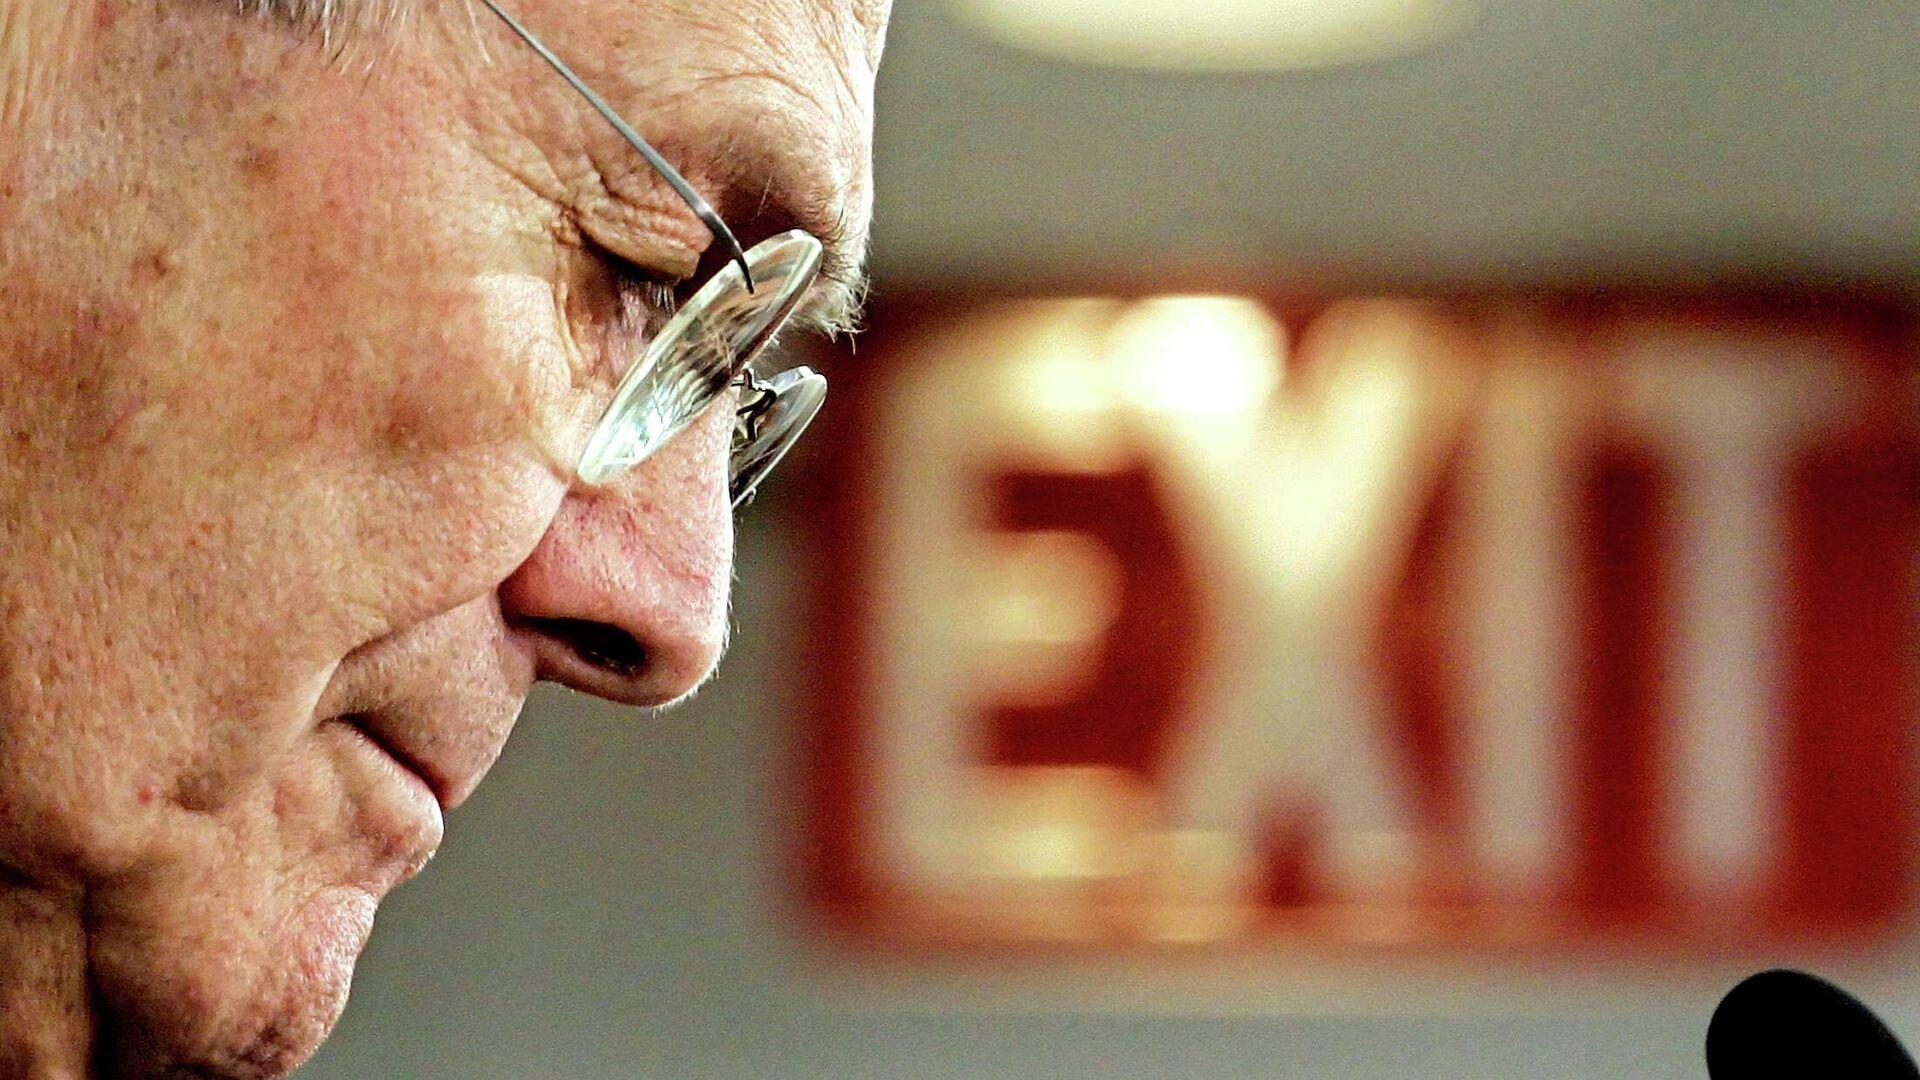 Der ehemalige US-Verteidigungsminister Donald Rumsfeld - SNA, 1920, 01.07.2021